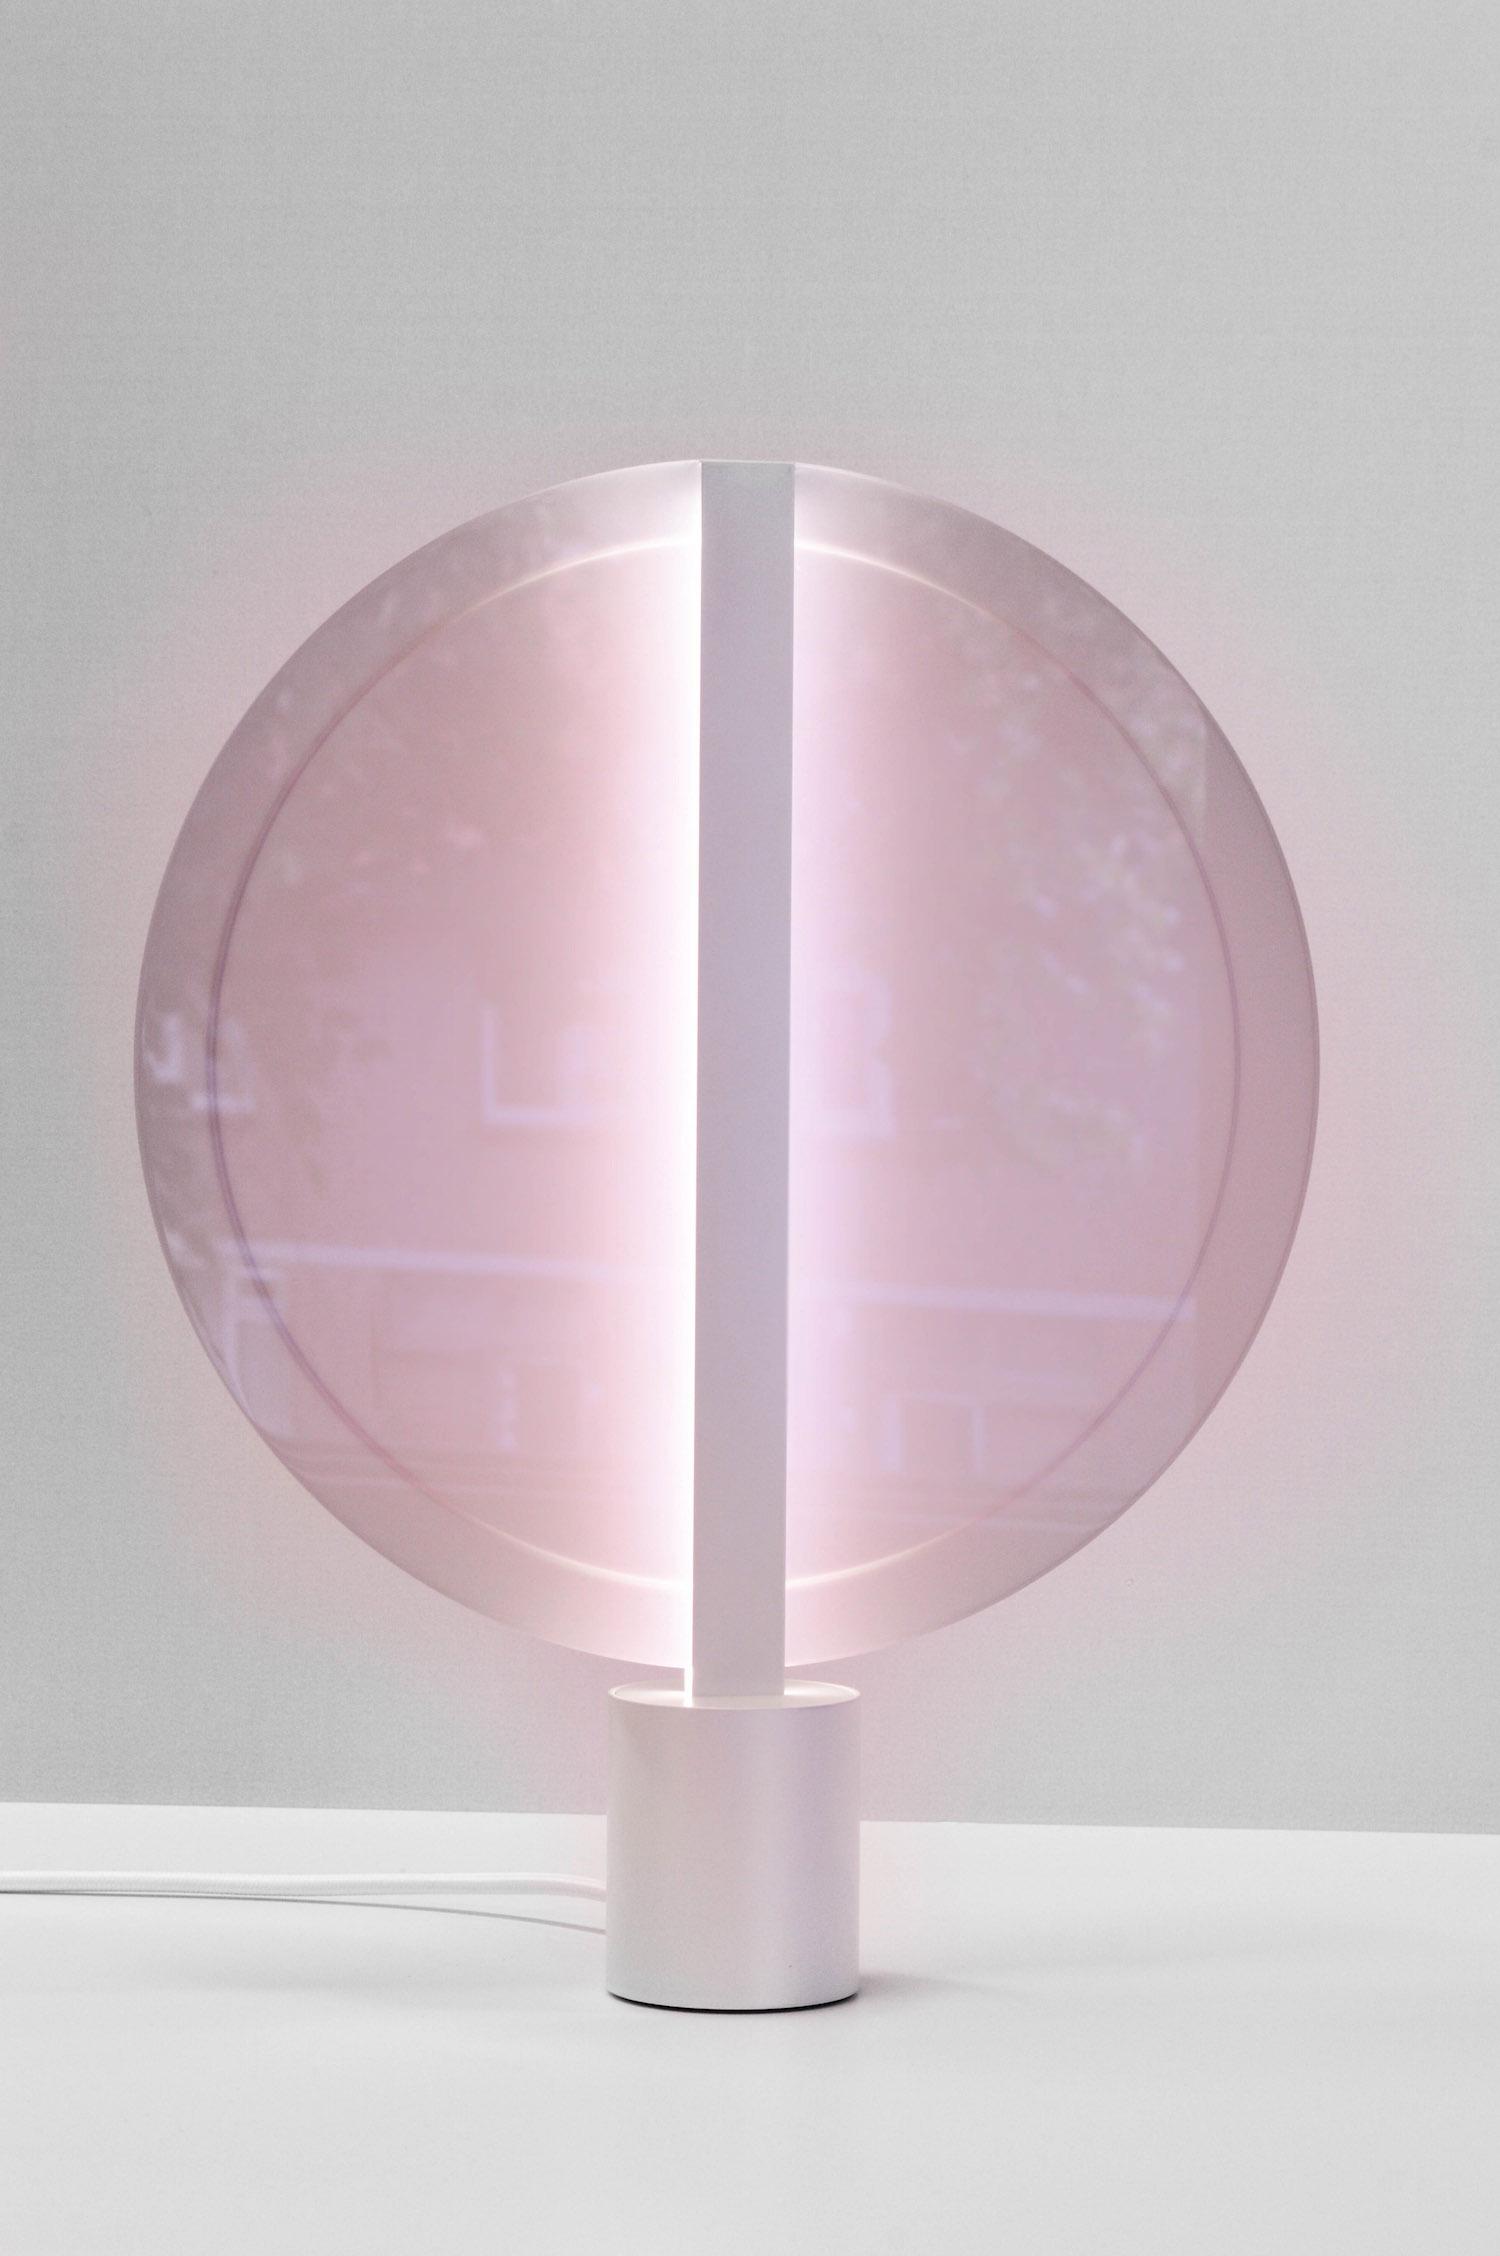 design_studio_fabian_zeijler-designs_lamps_sun_gazing_09